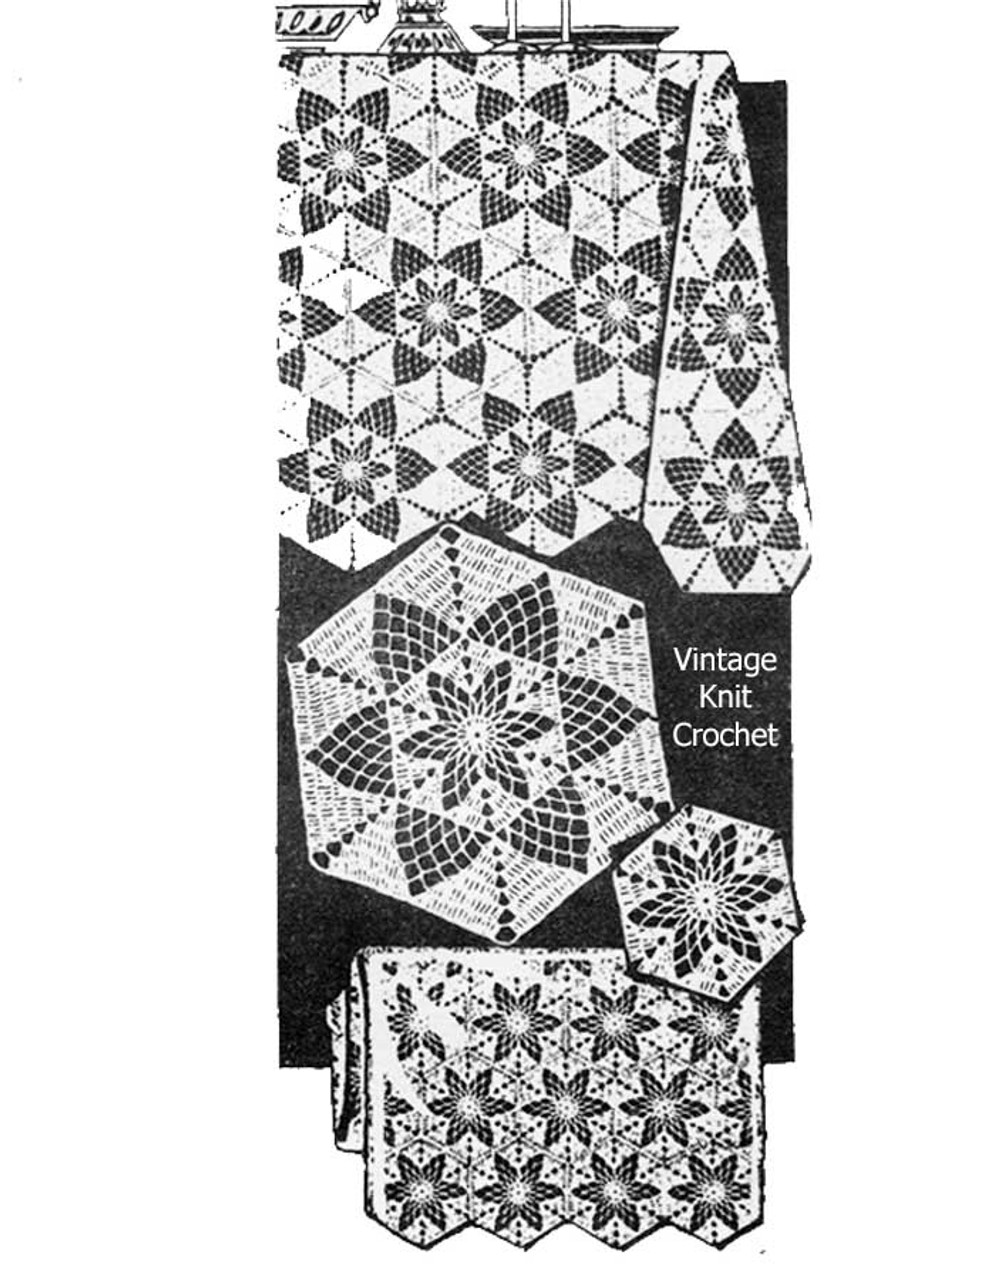 Vintage Star Tablecloth Medallion Pattern Alice Brooks Design 7309